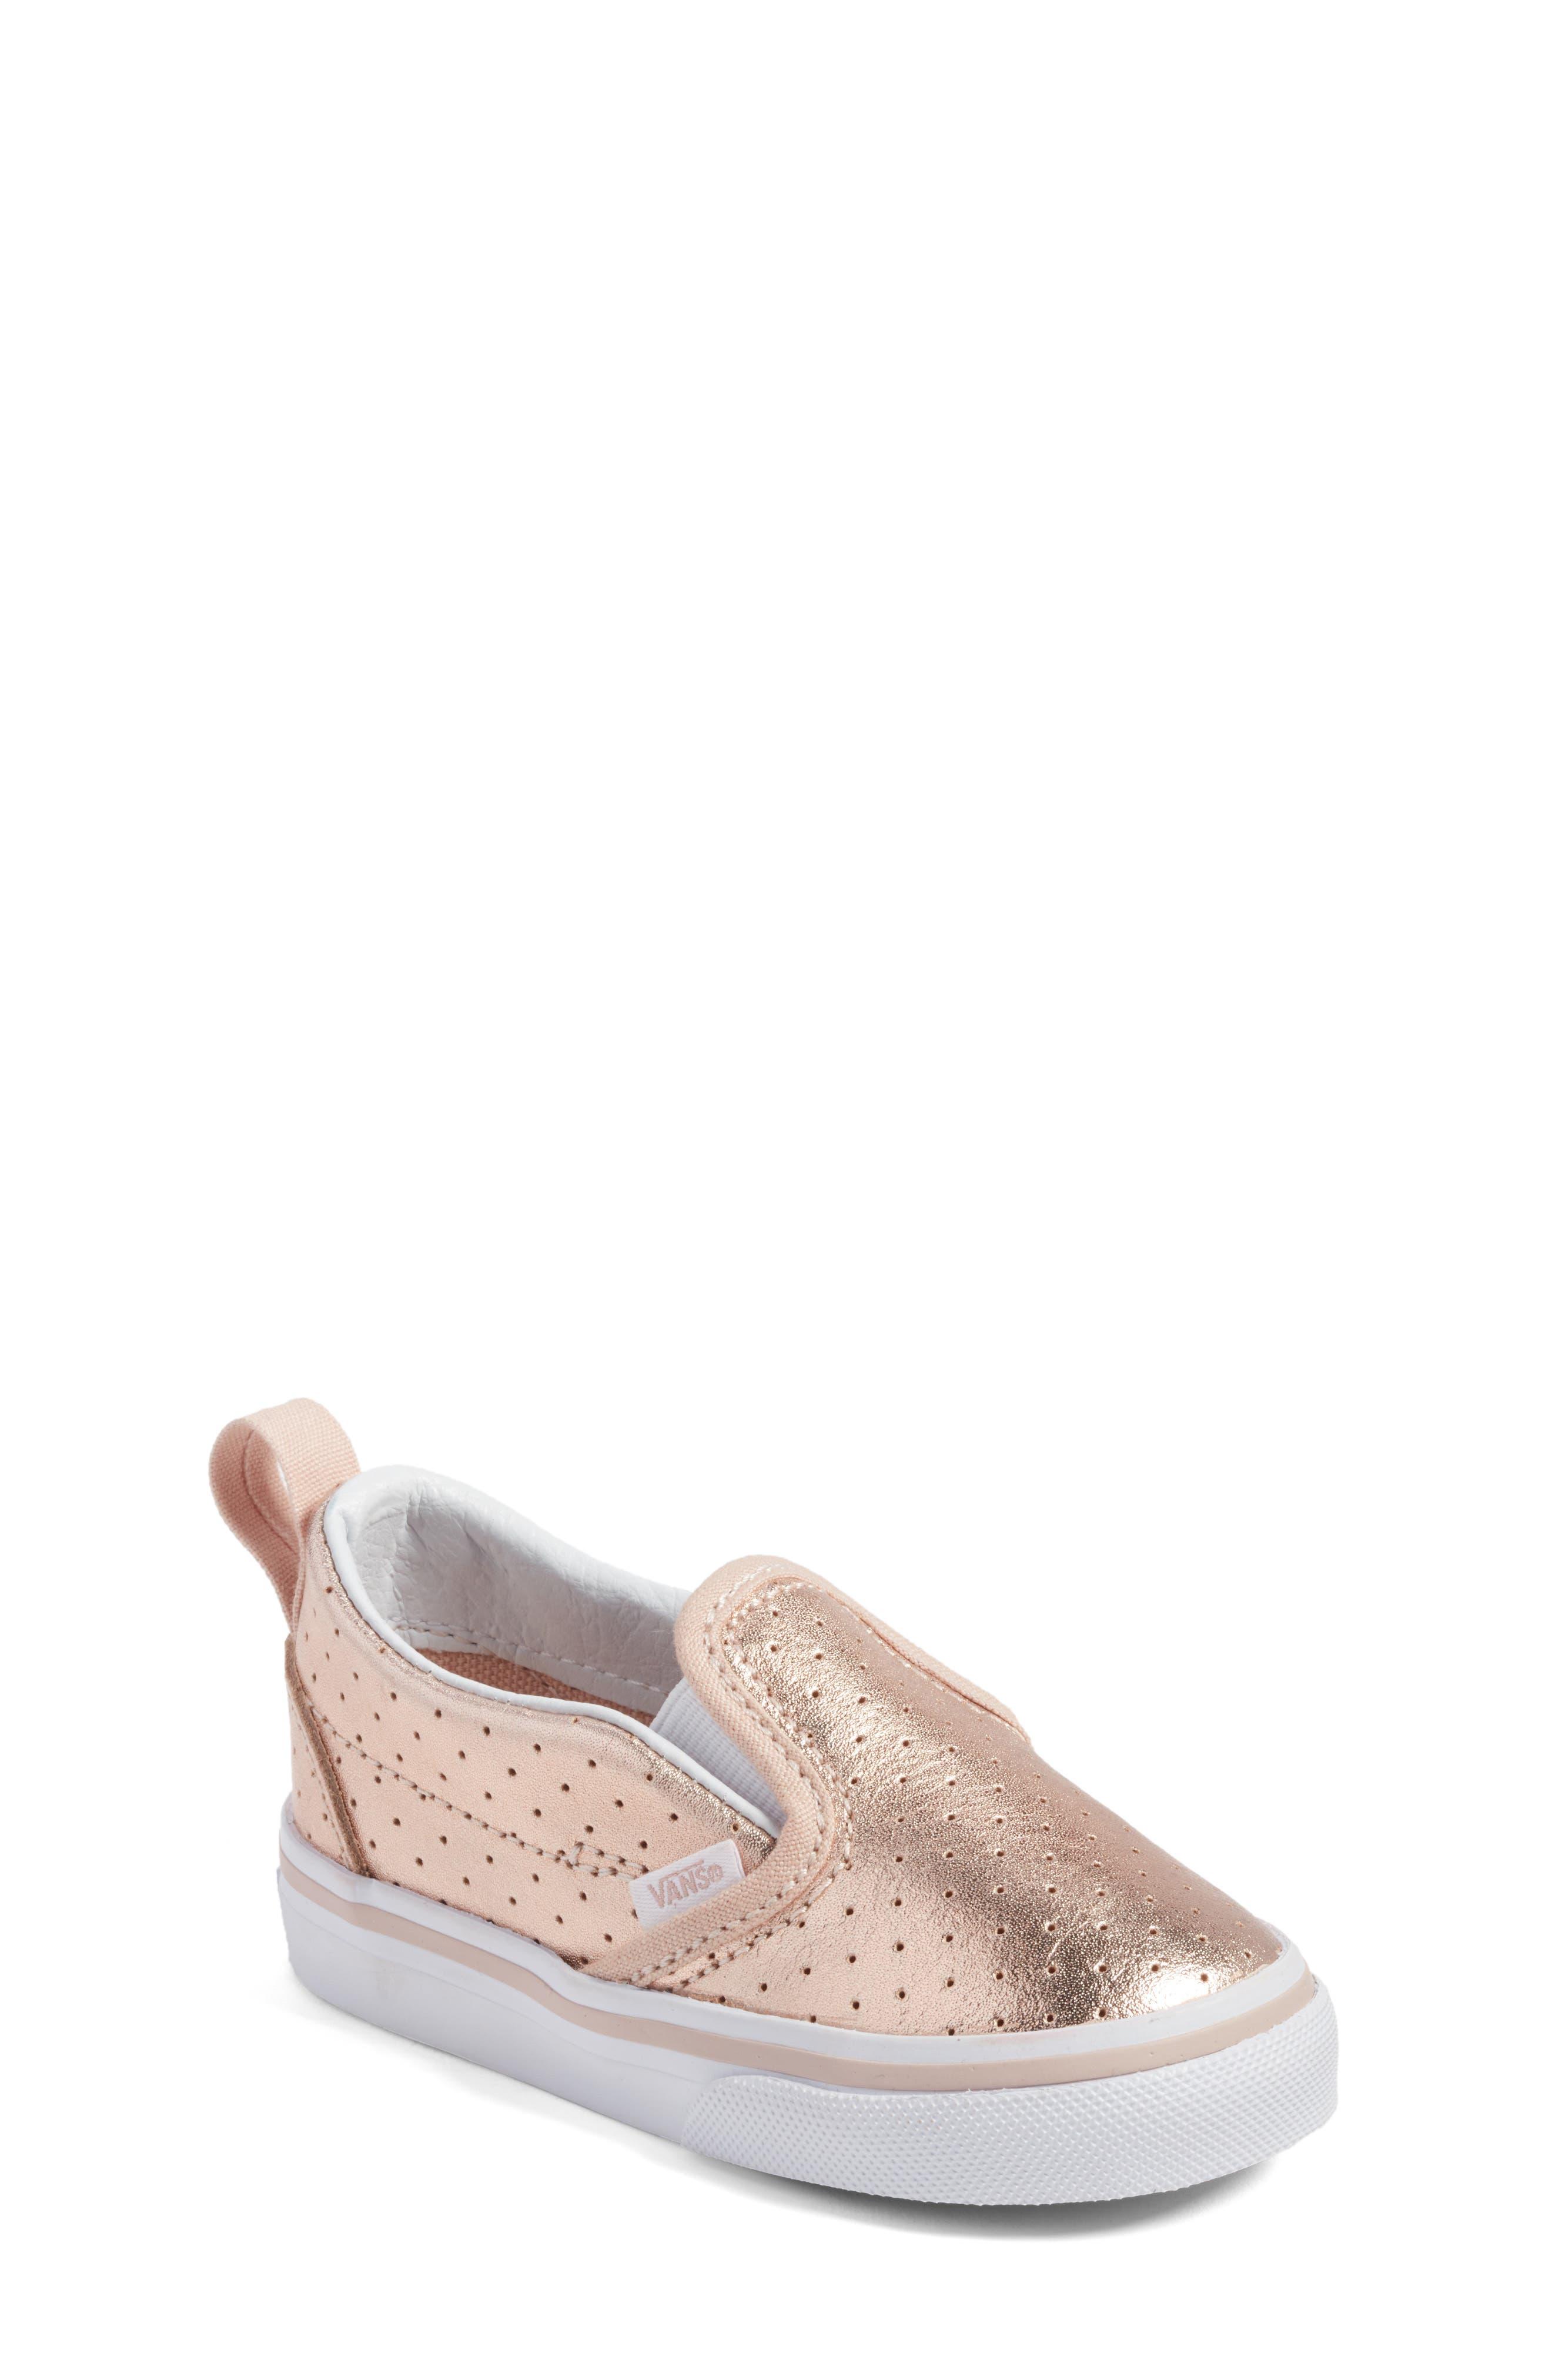 ,                             'Classic' Slip-On Sneaker,                             Main thumbnail 13, color,                             220